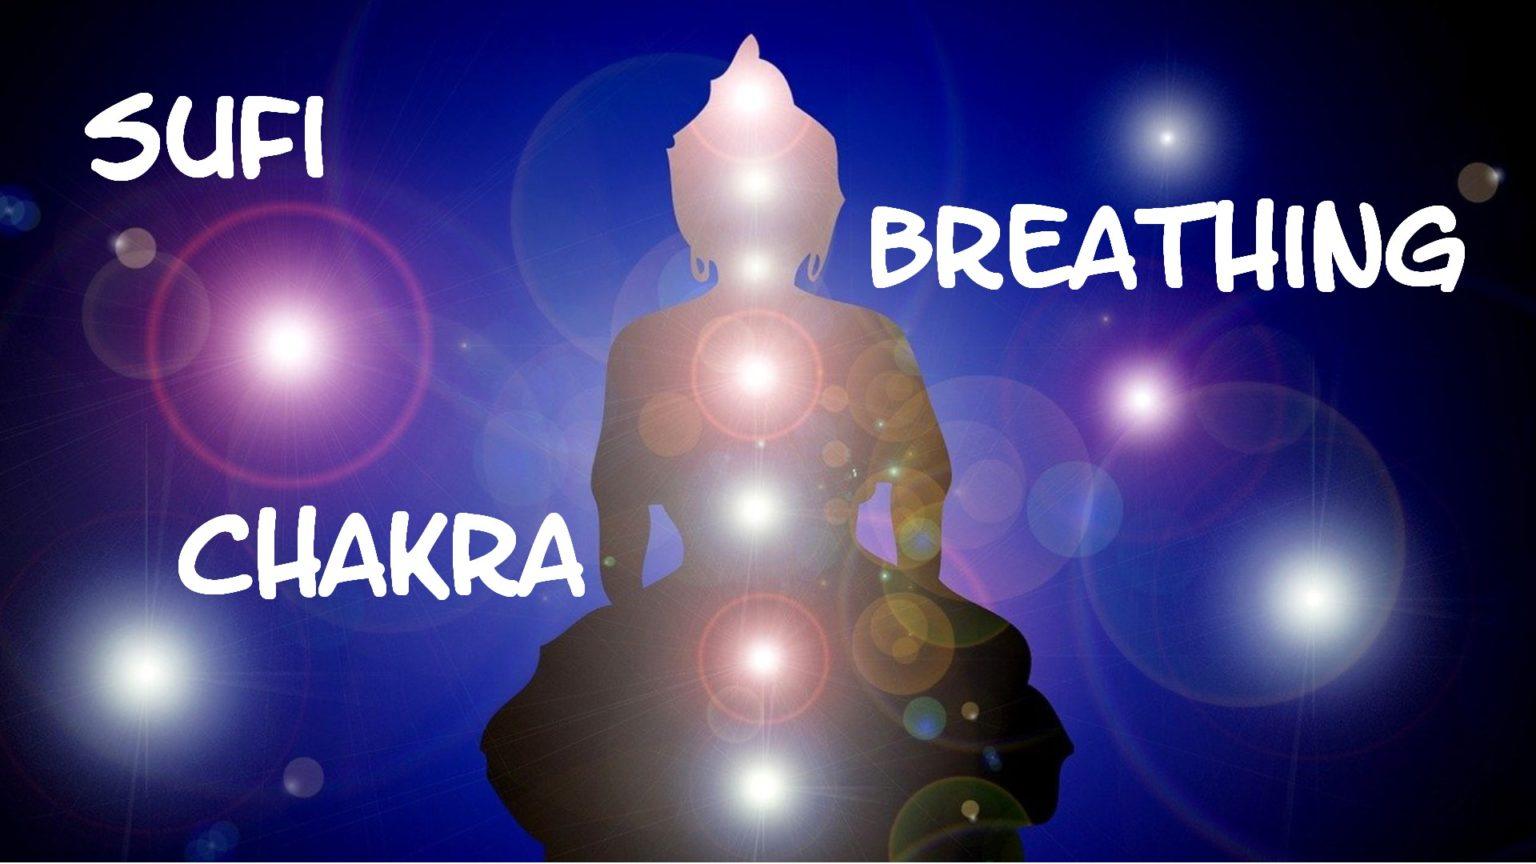 Sufi Chakra Breathing Wild Life Tantra